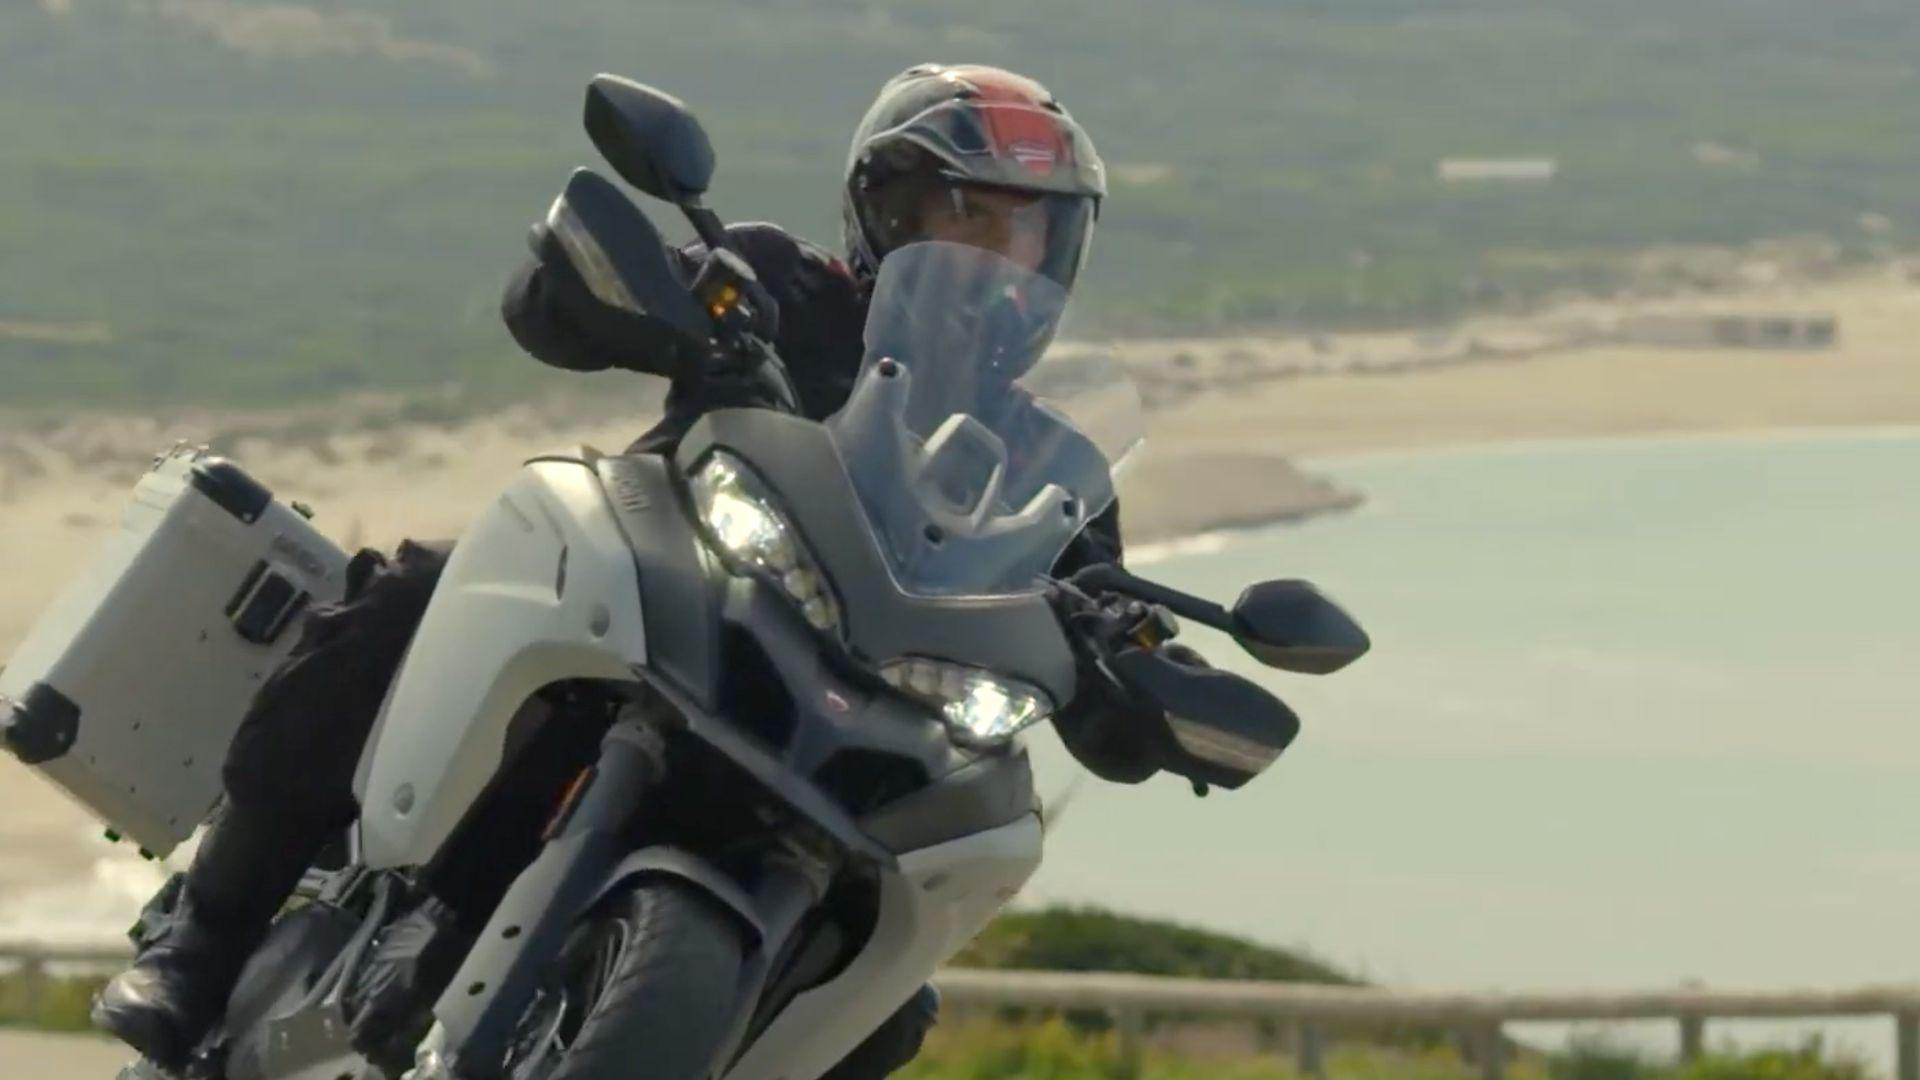 Ducati Multistrada 1200 Enduro   K+